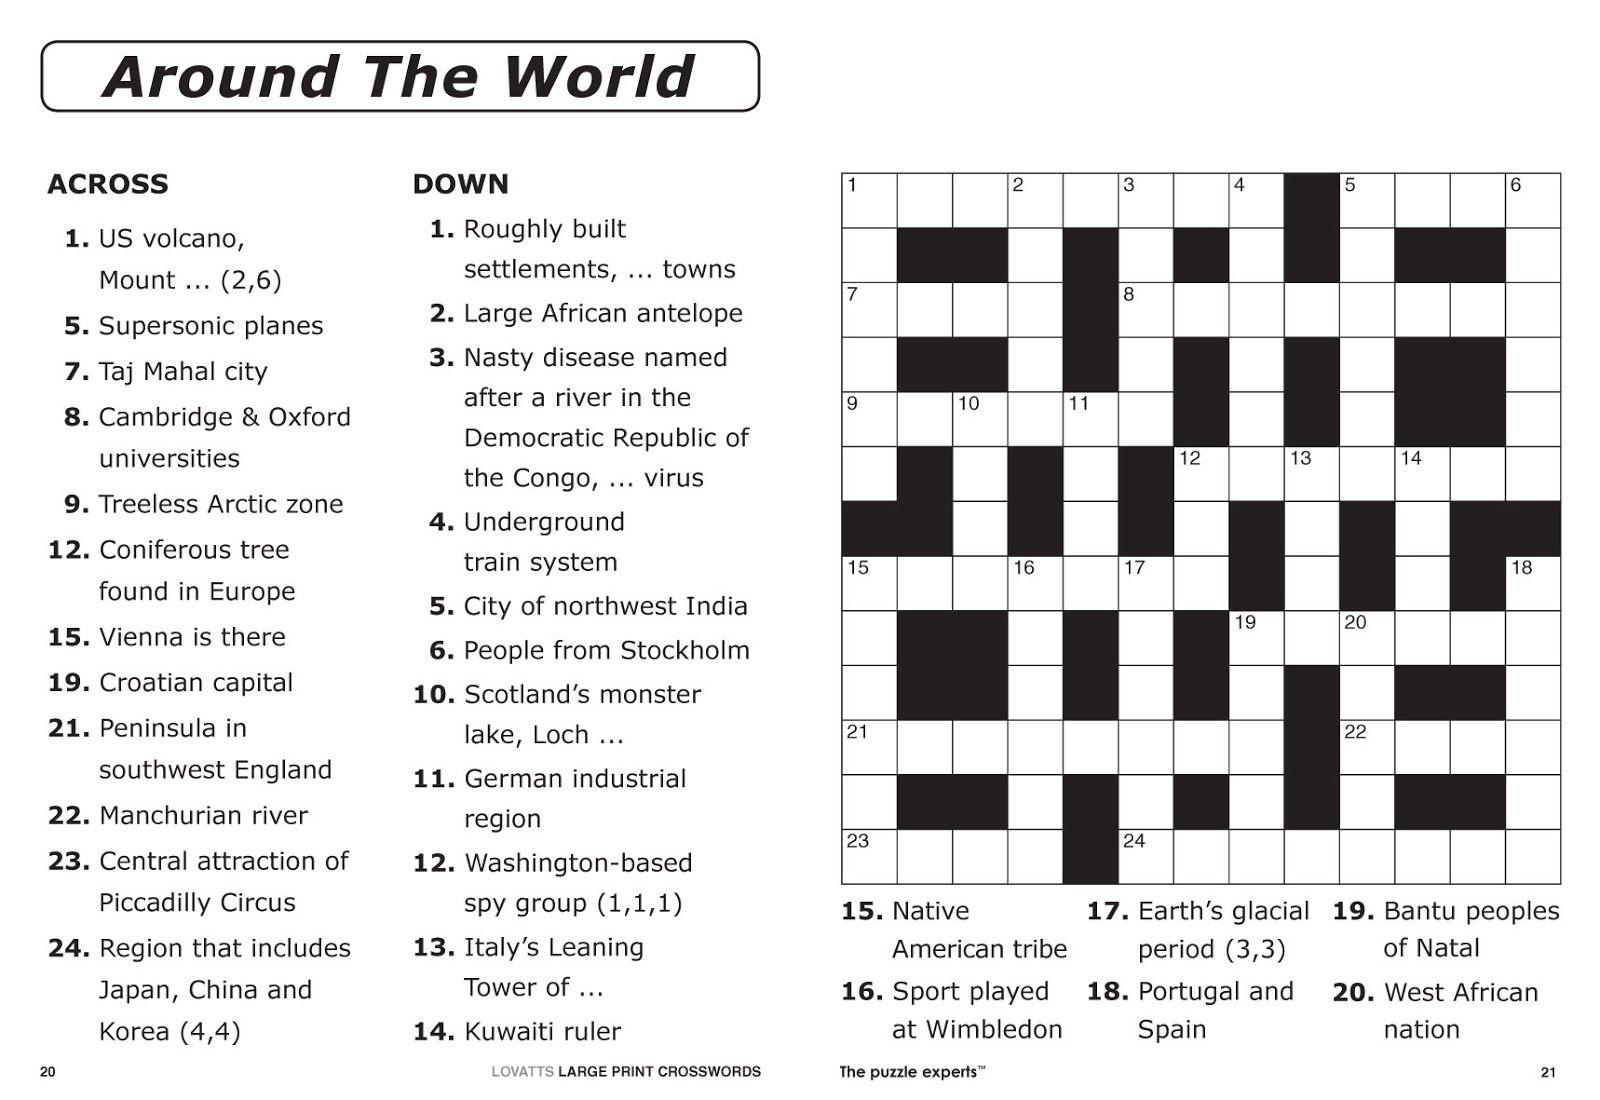 Free Printable Large Print Crossword Puzzles   M3U8 - Free Printable Sports Crossword Puzzles